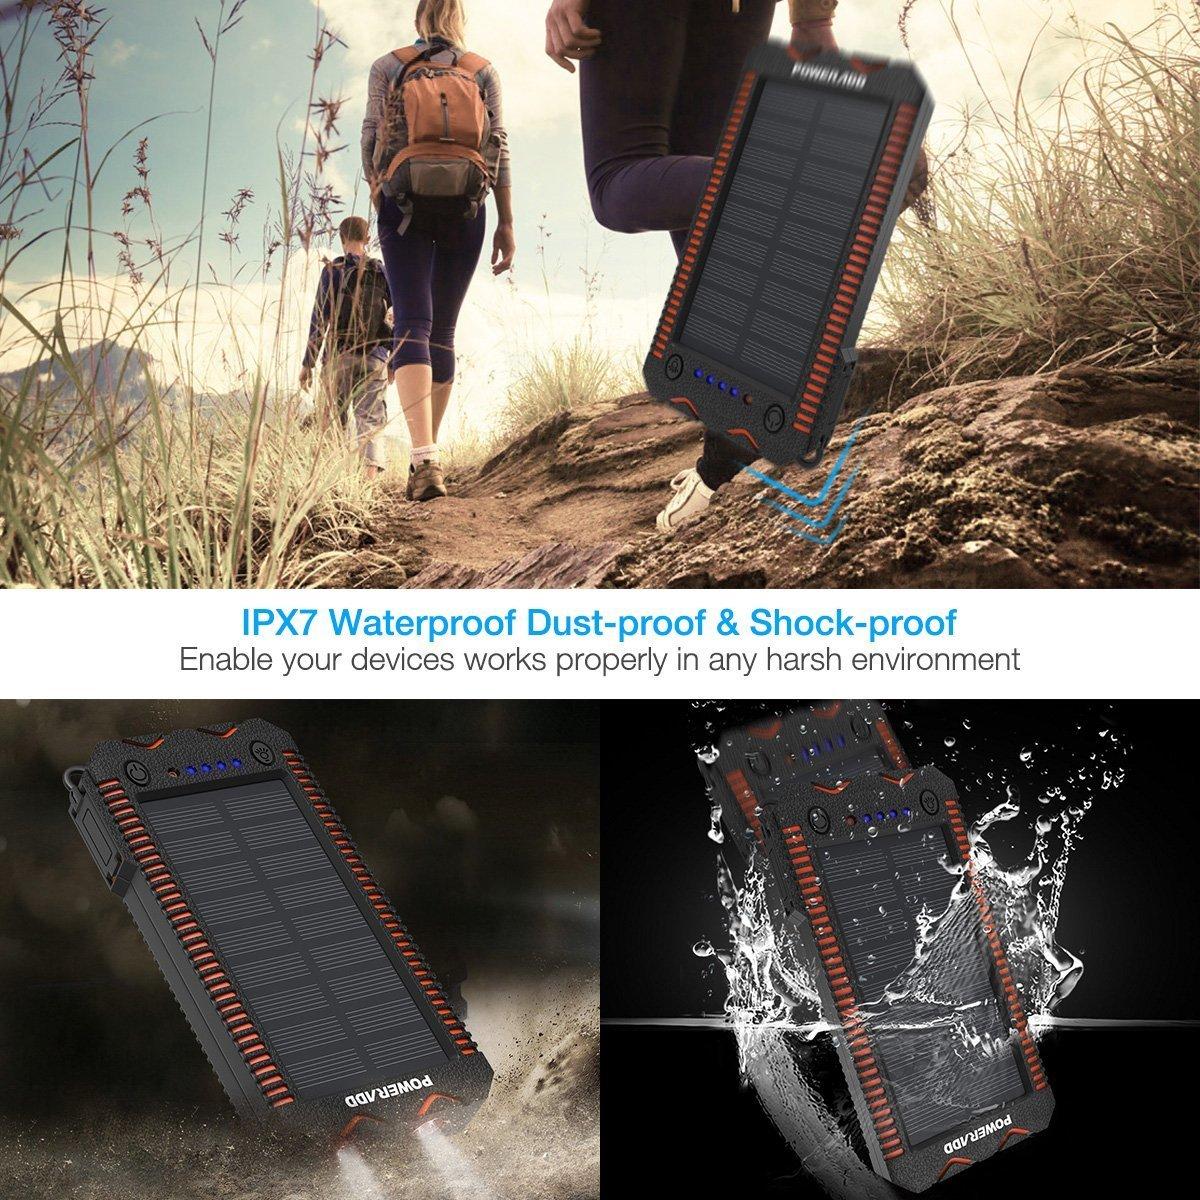 Poweradd 12000mAh Dual USB Tragbare Solar Ladegerät,Power Bank für iPhone und Handy